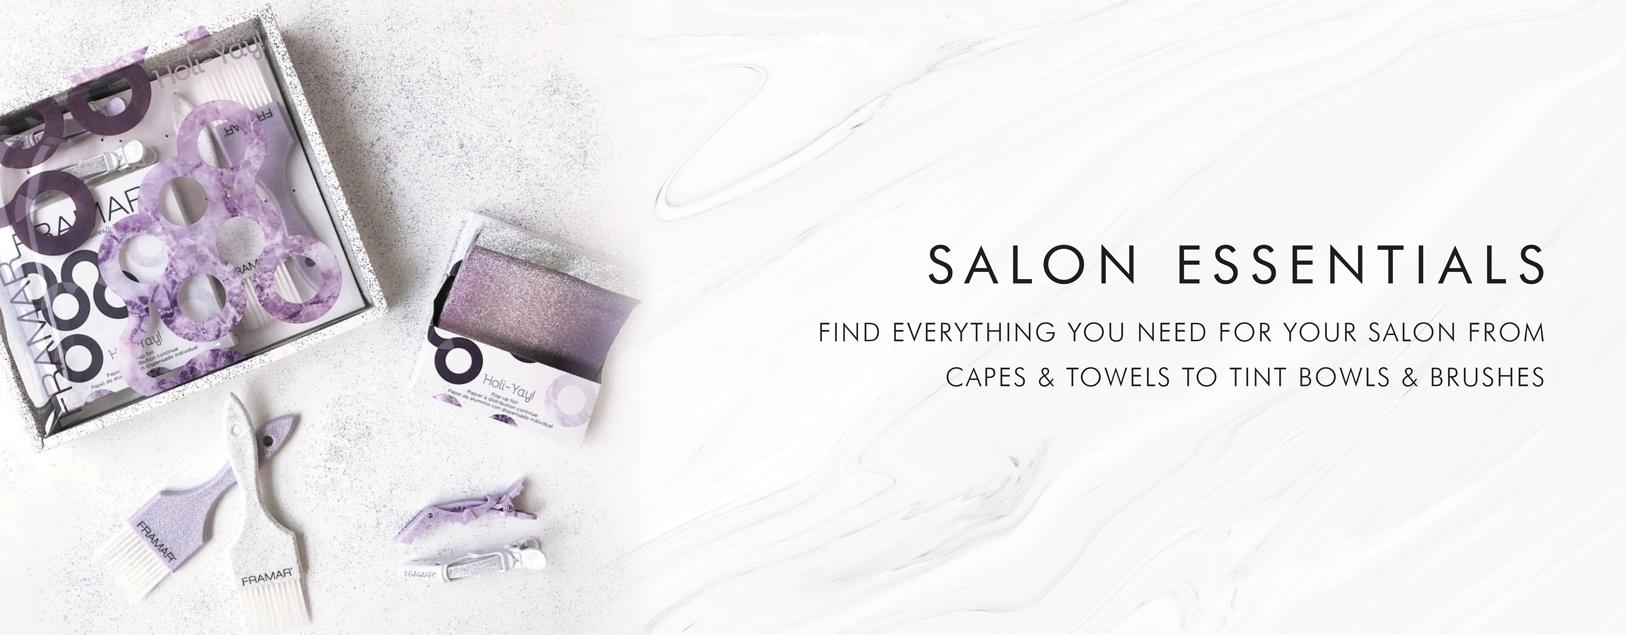 Salon Essentials